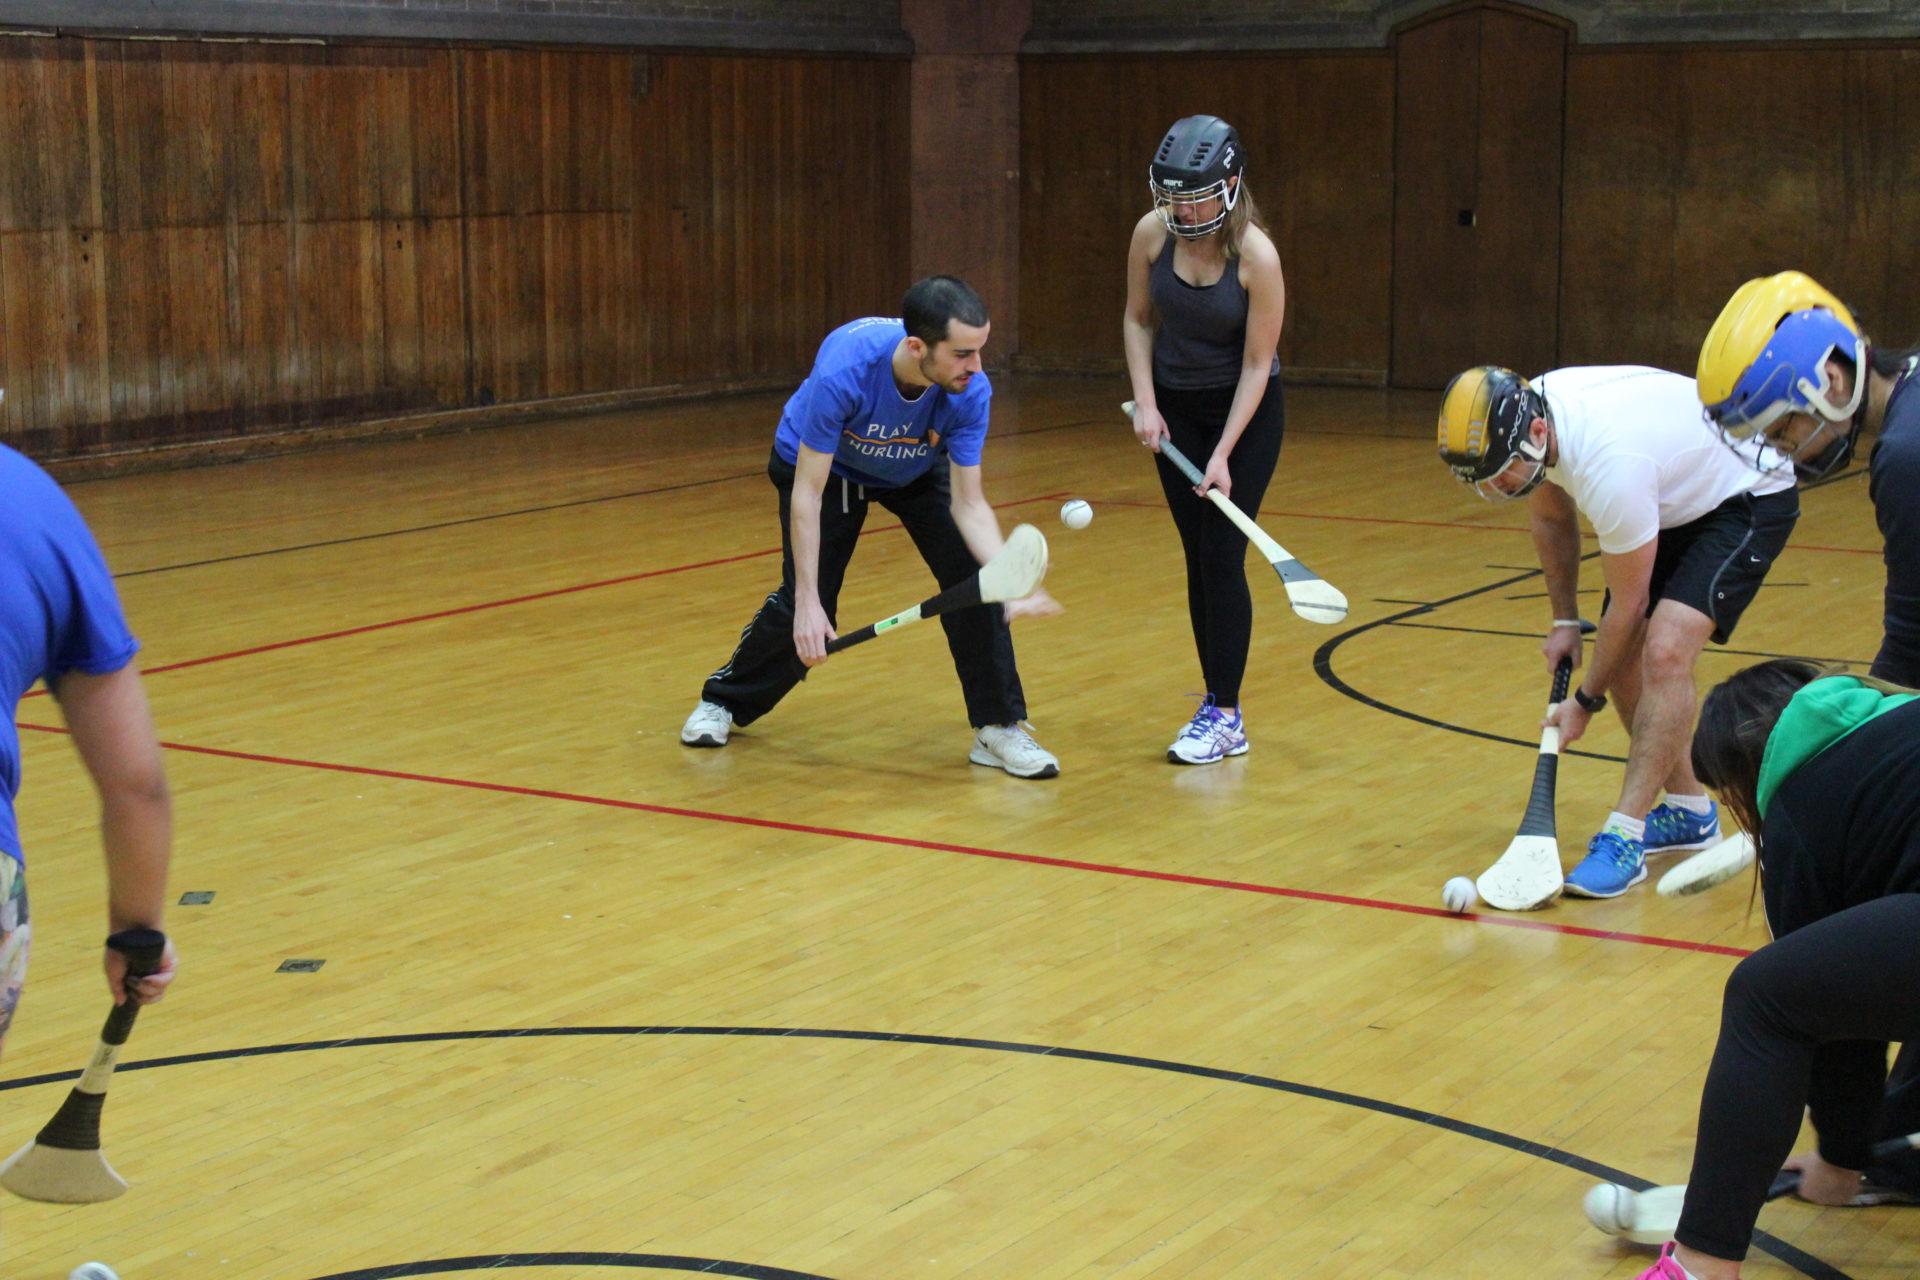 UofT Hurling Lessons roll lift